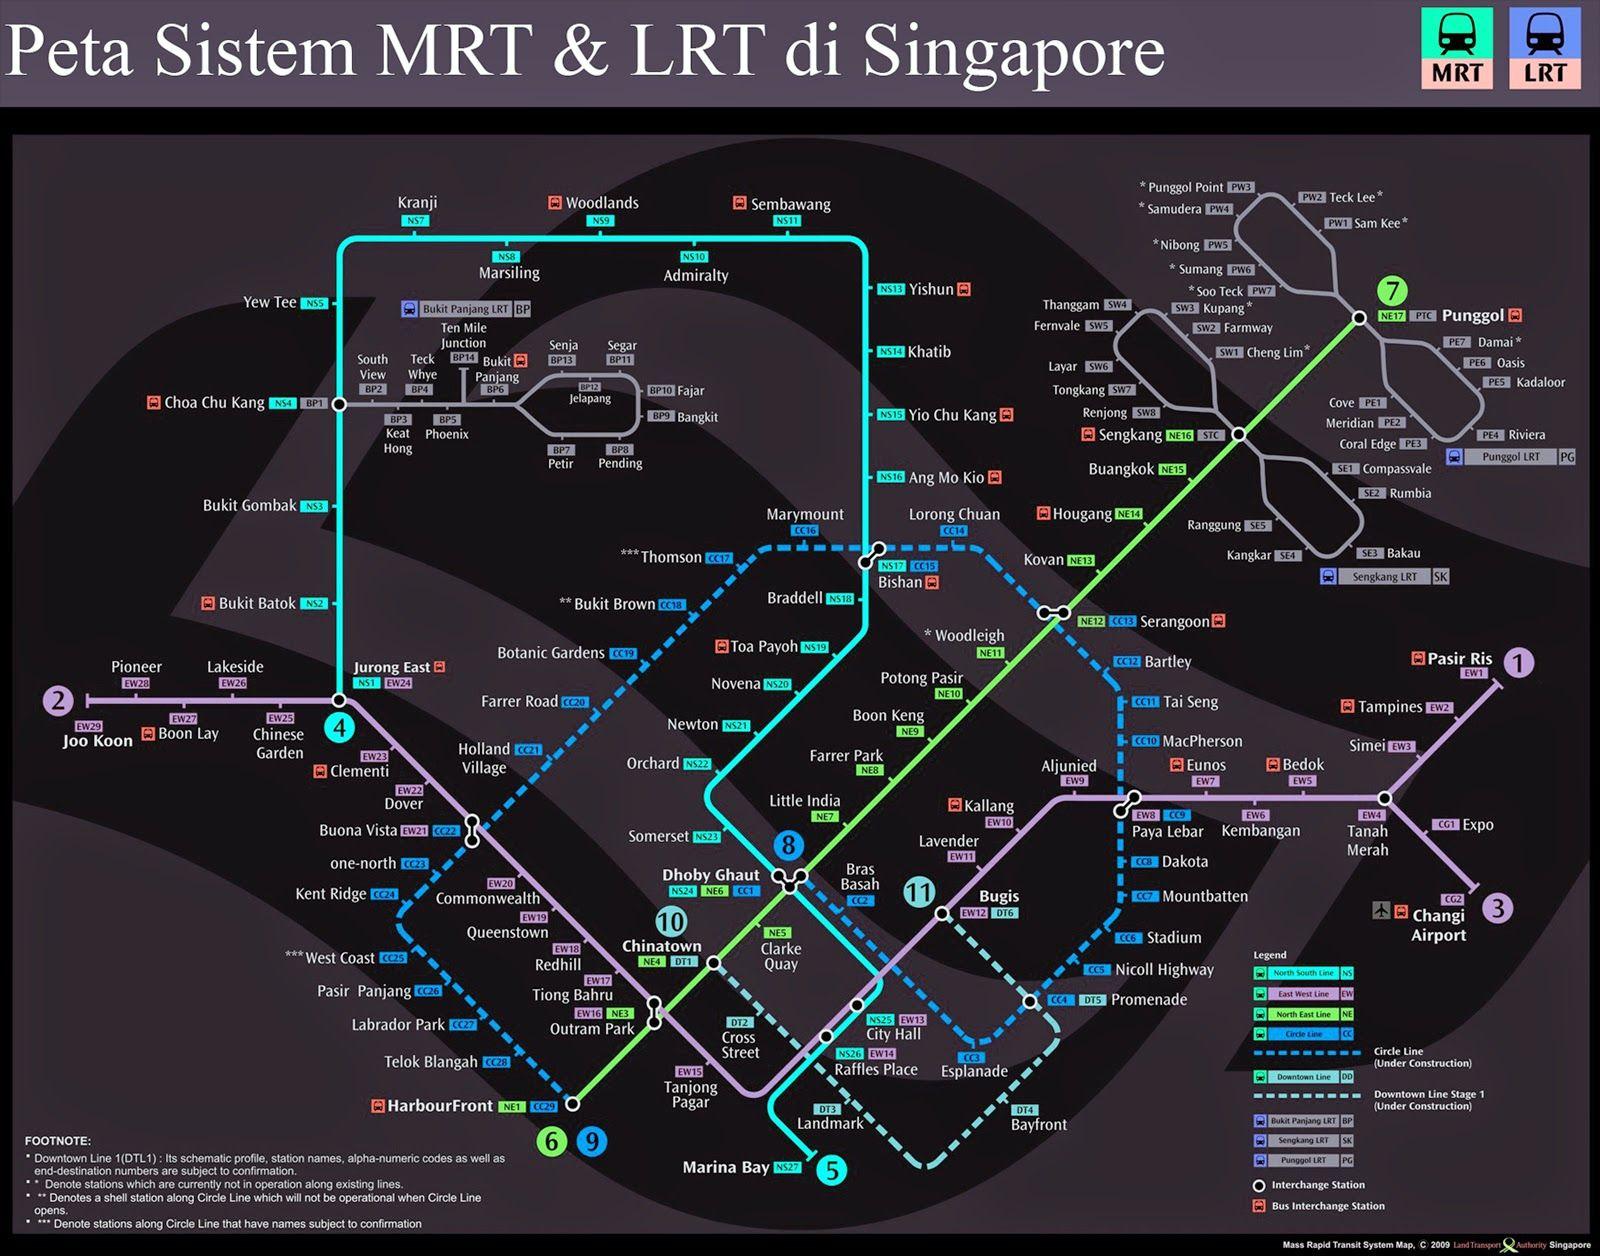 30 Stasiun Mrt Di Singapore 10 Hotel Terdekat Bagian Ii Somerset Hotel Peta